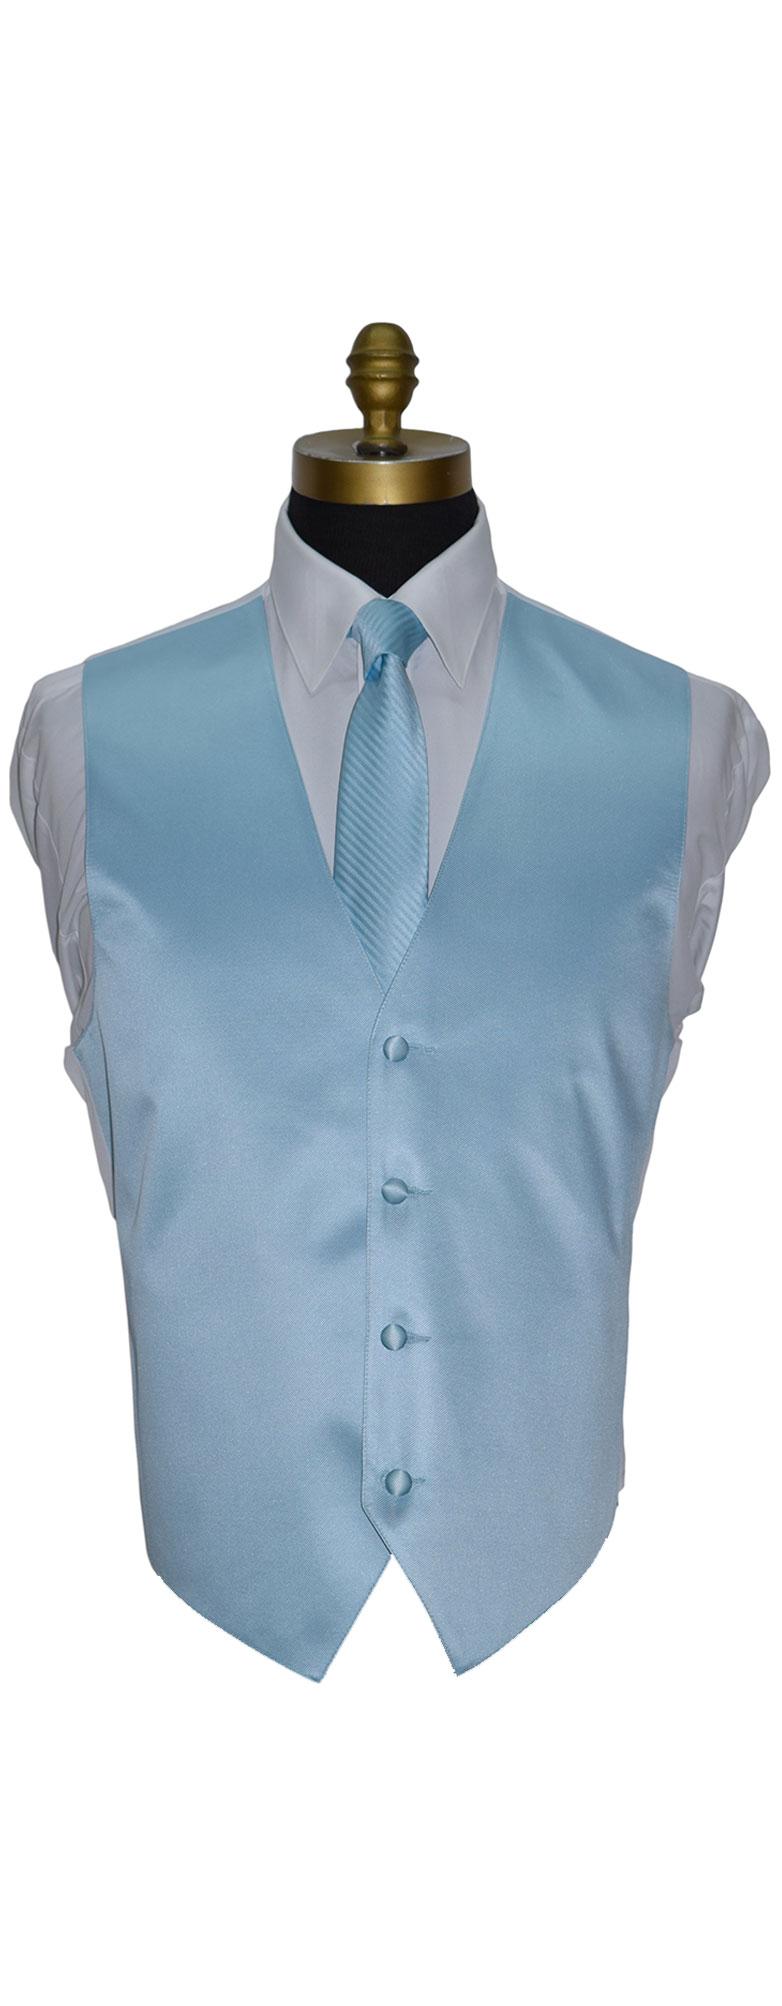 Capri Blue Tuxedo Vest